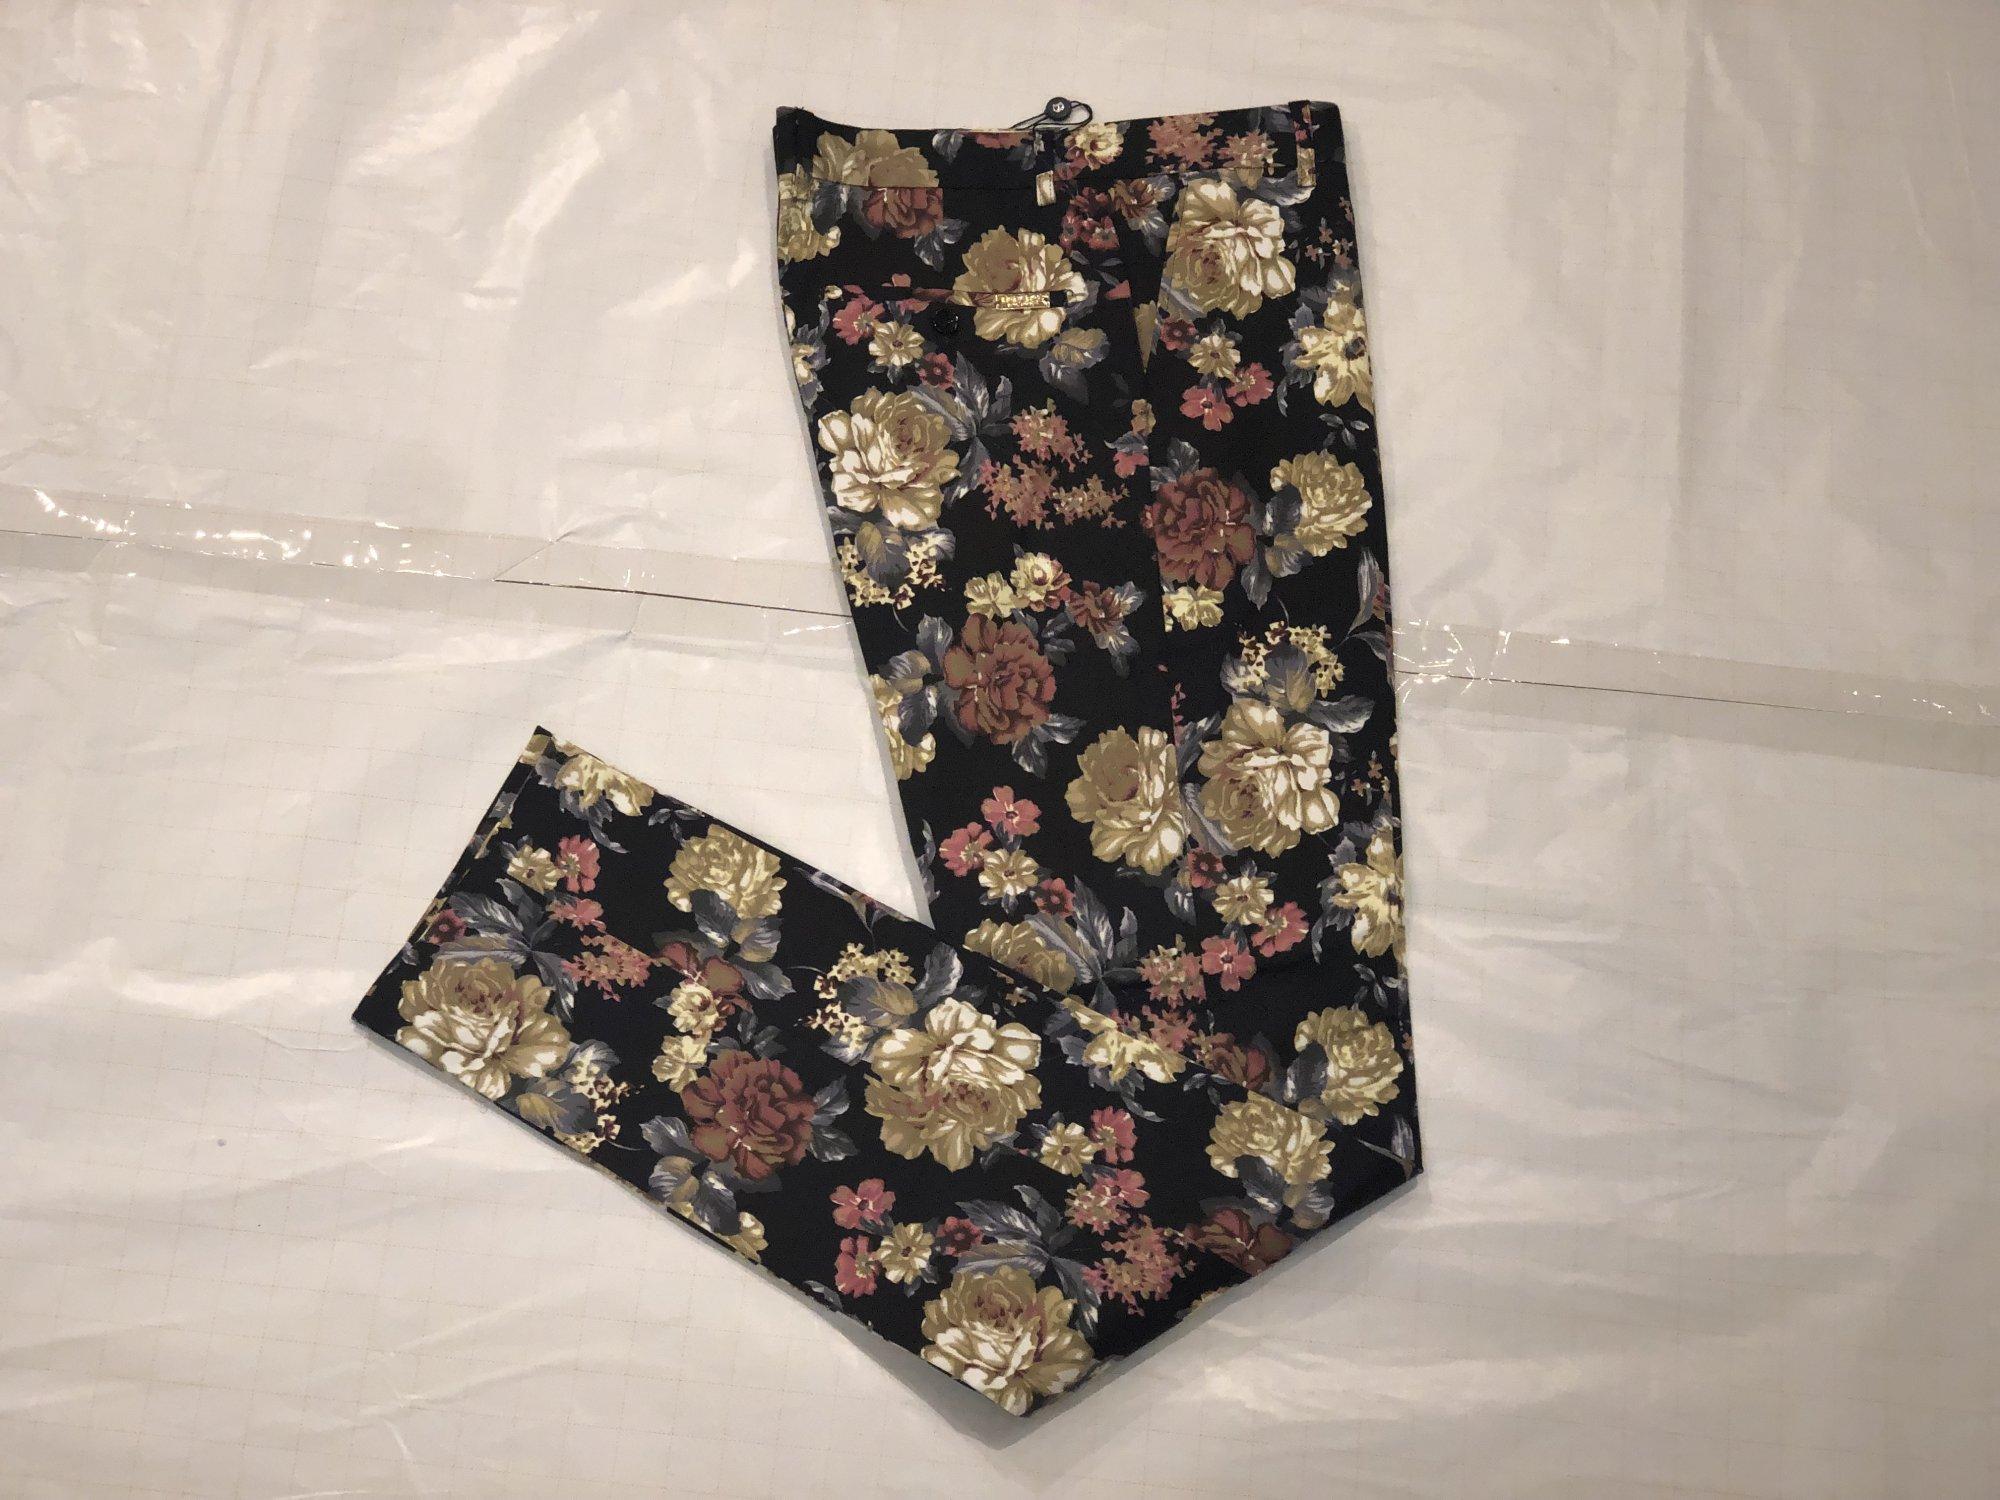 BARABAS DRESS PANTS